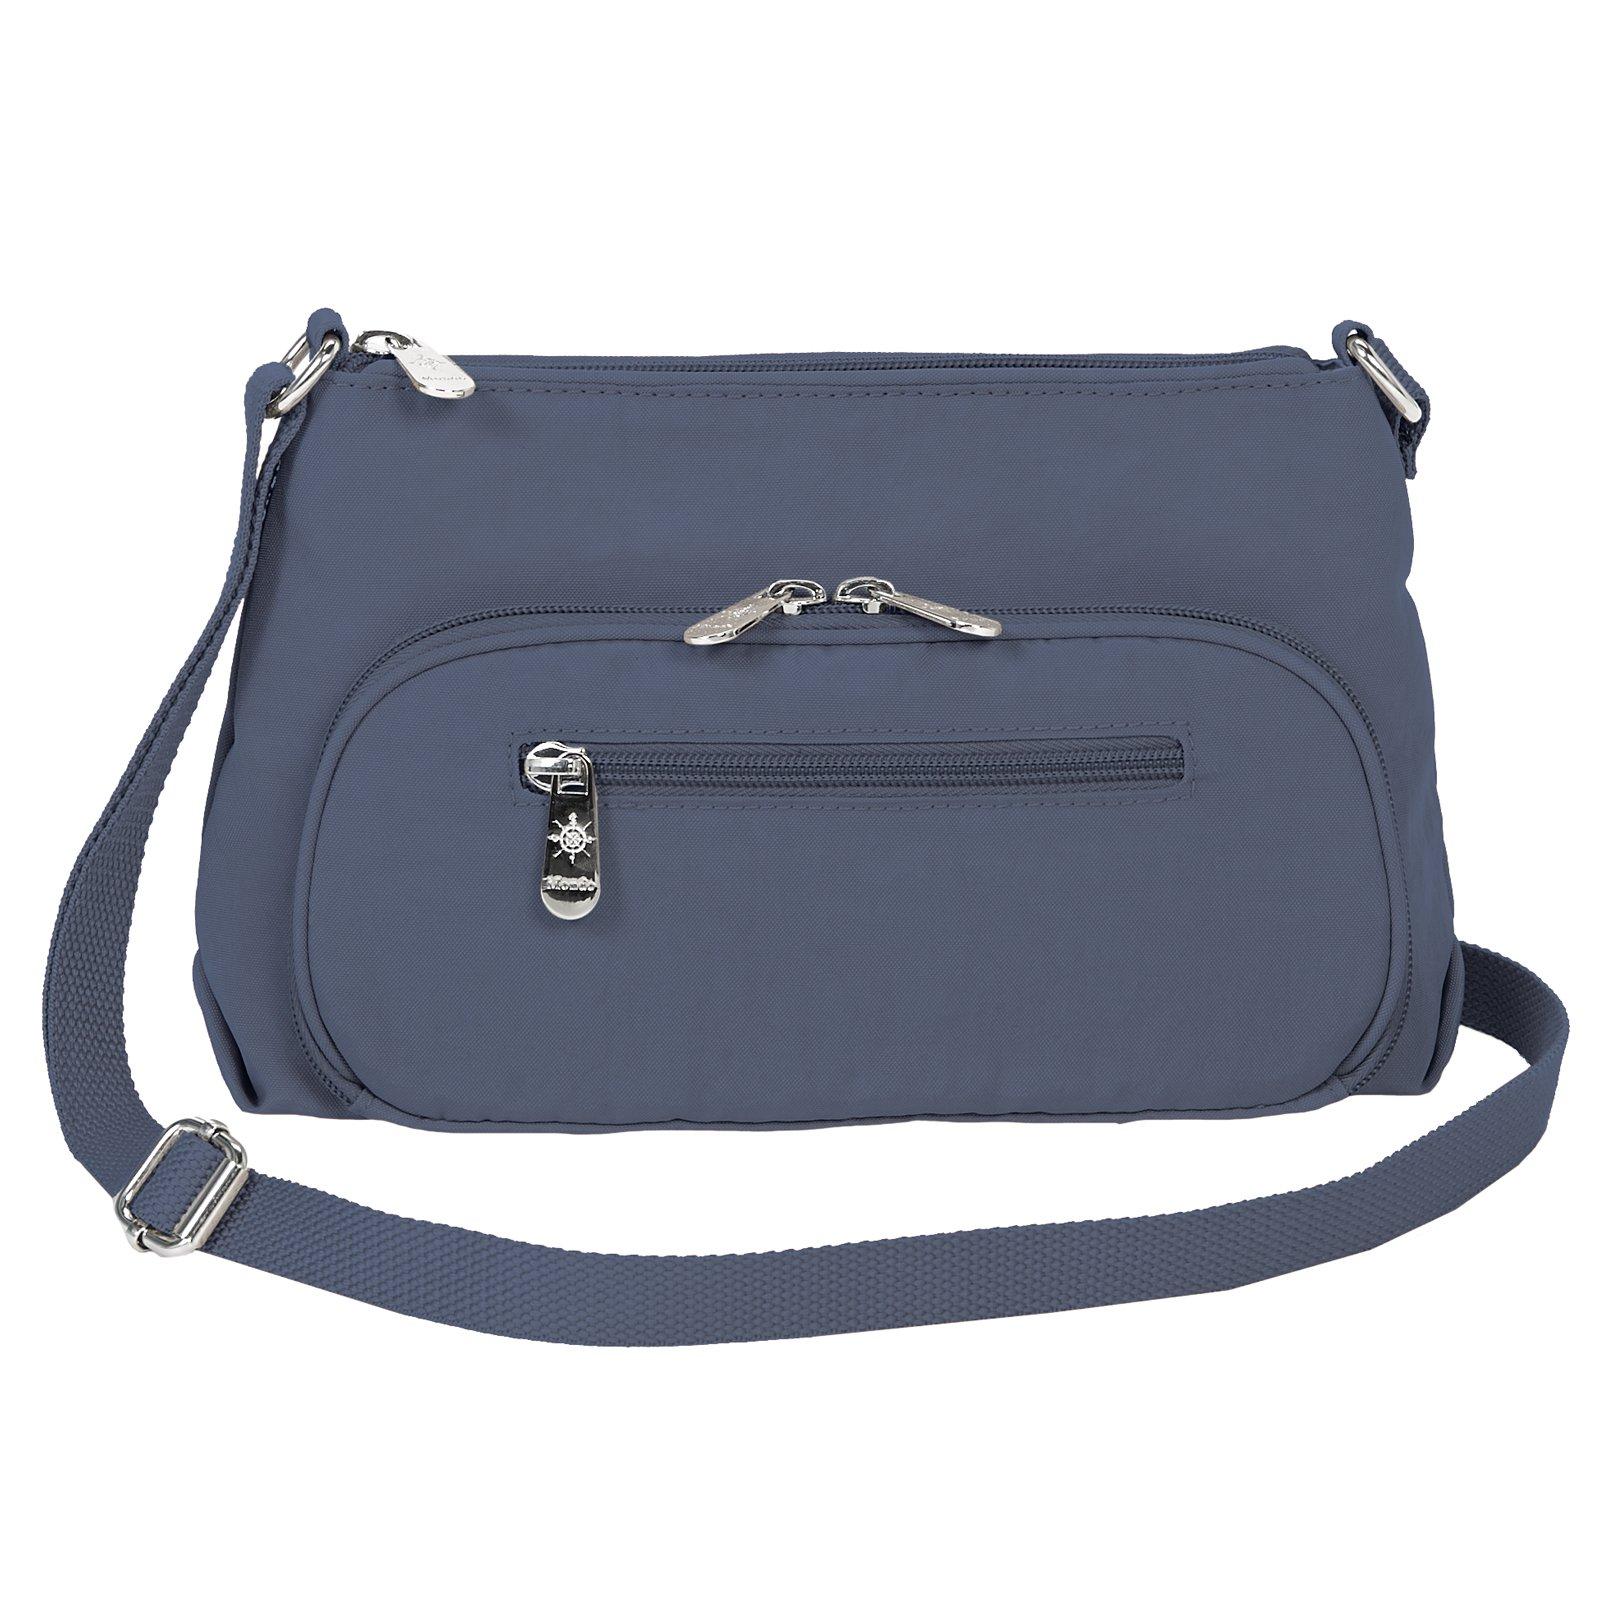 Mondo Nylon Small Crossbody Lightweight Multi Function Travel Handbag